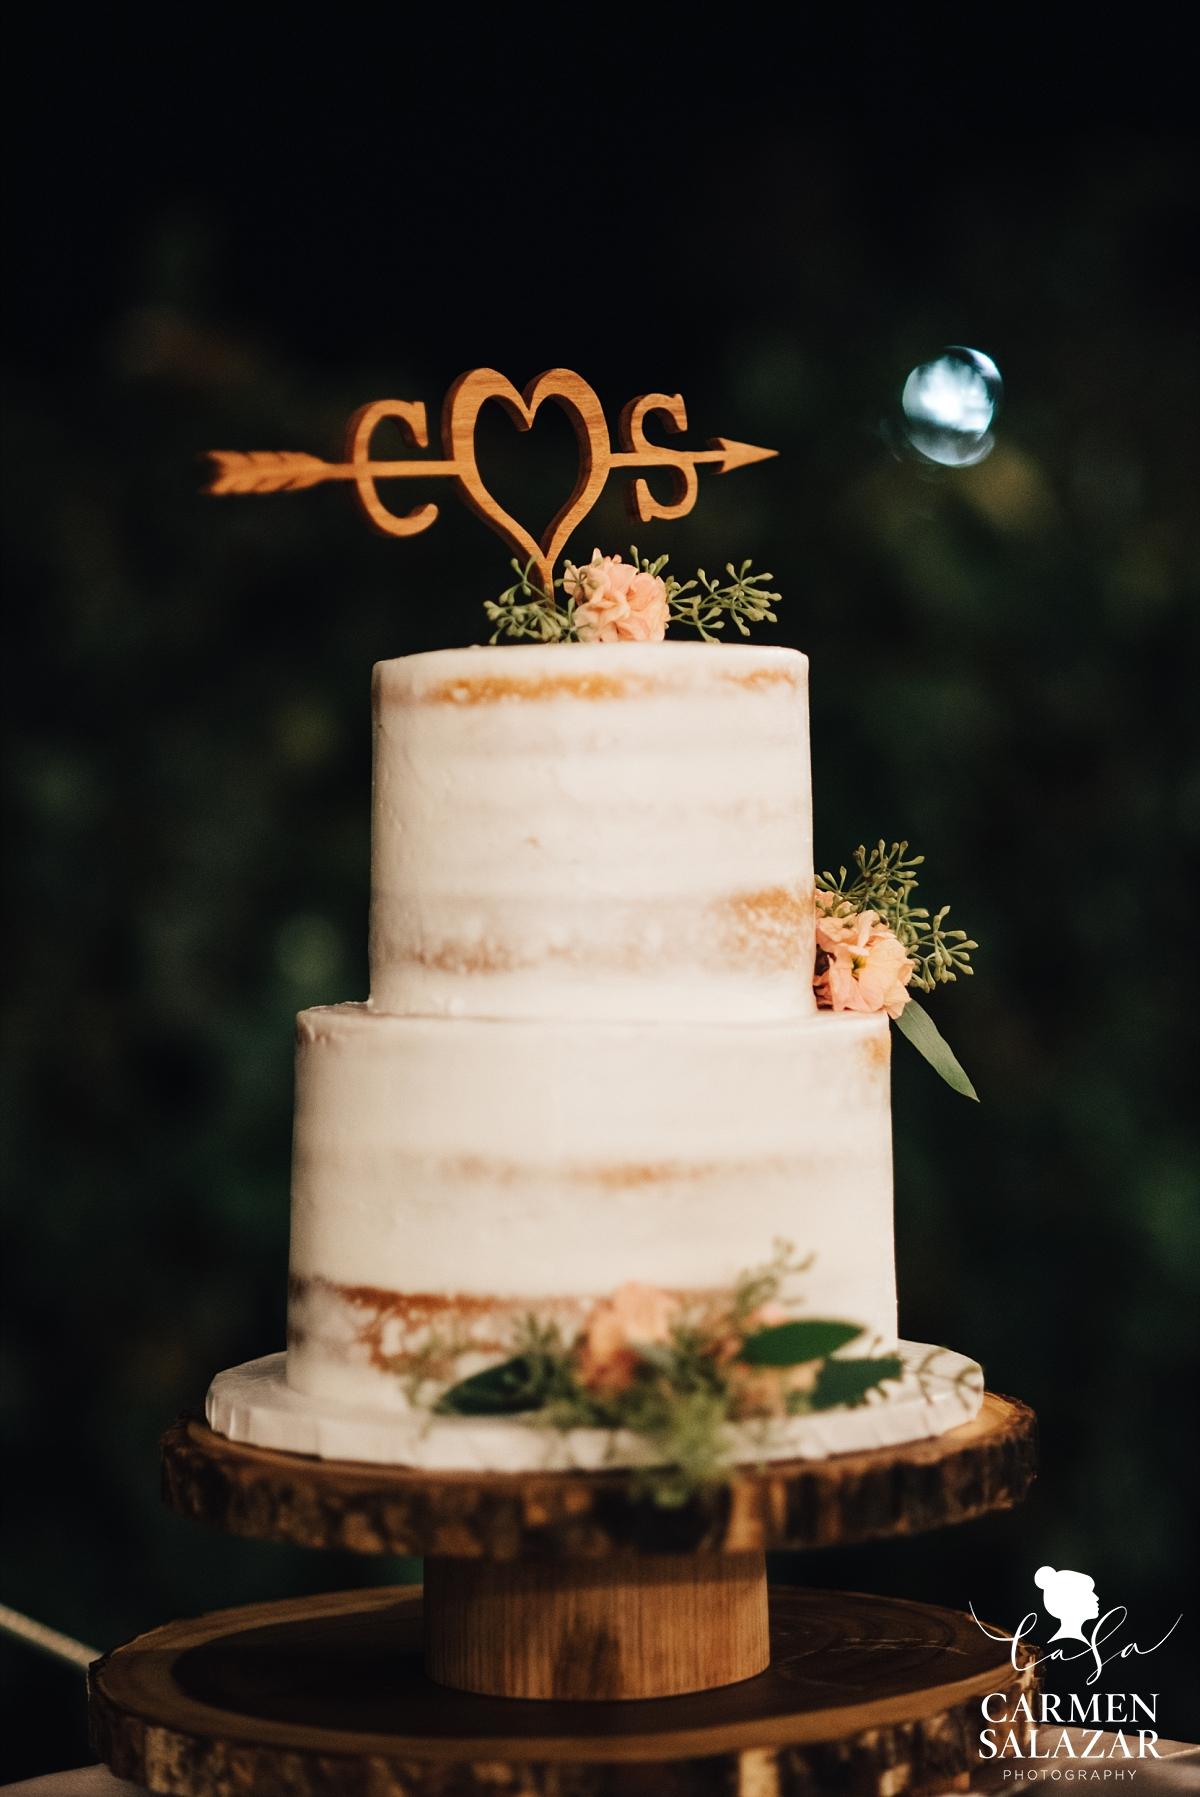 DIY wood cake topper on modern wedding cake - Carmen Salazar